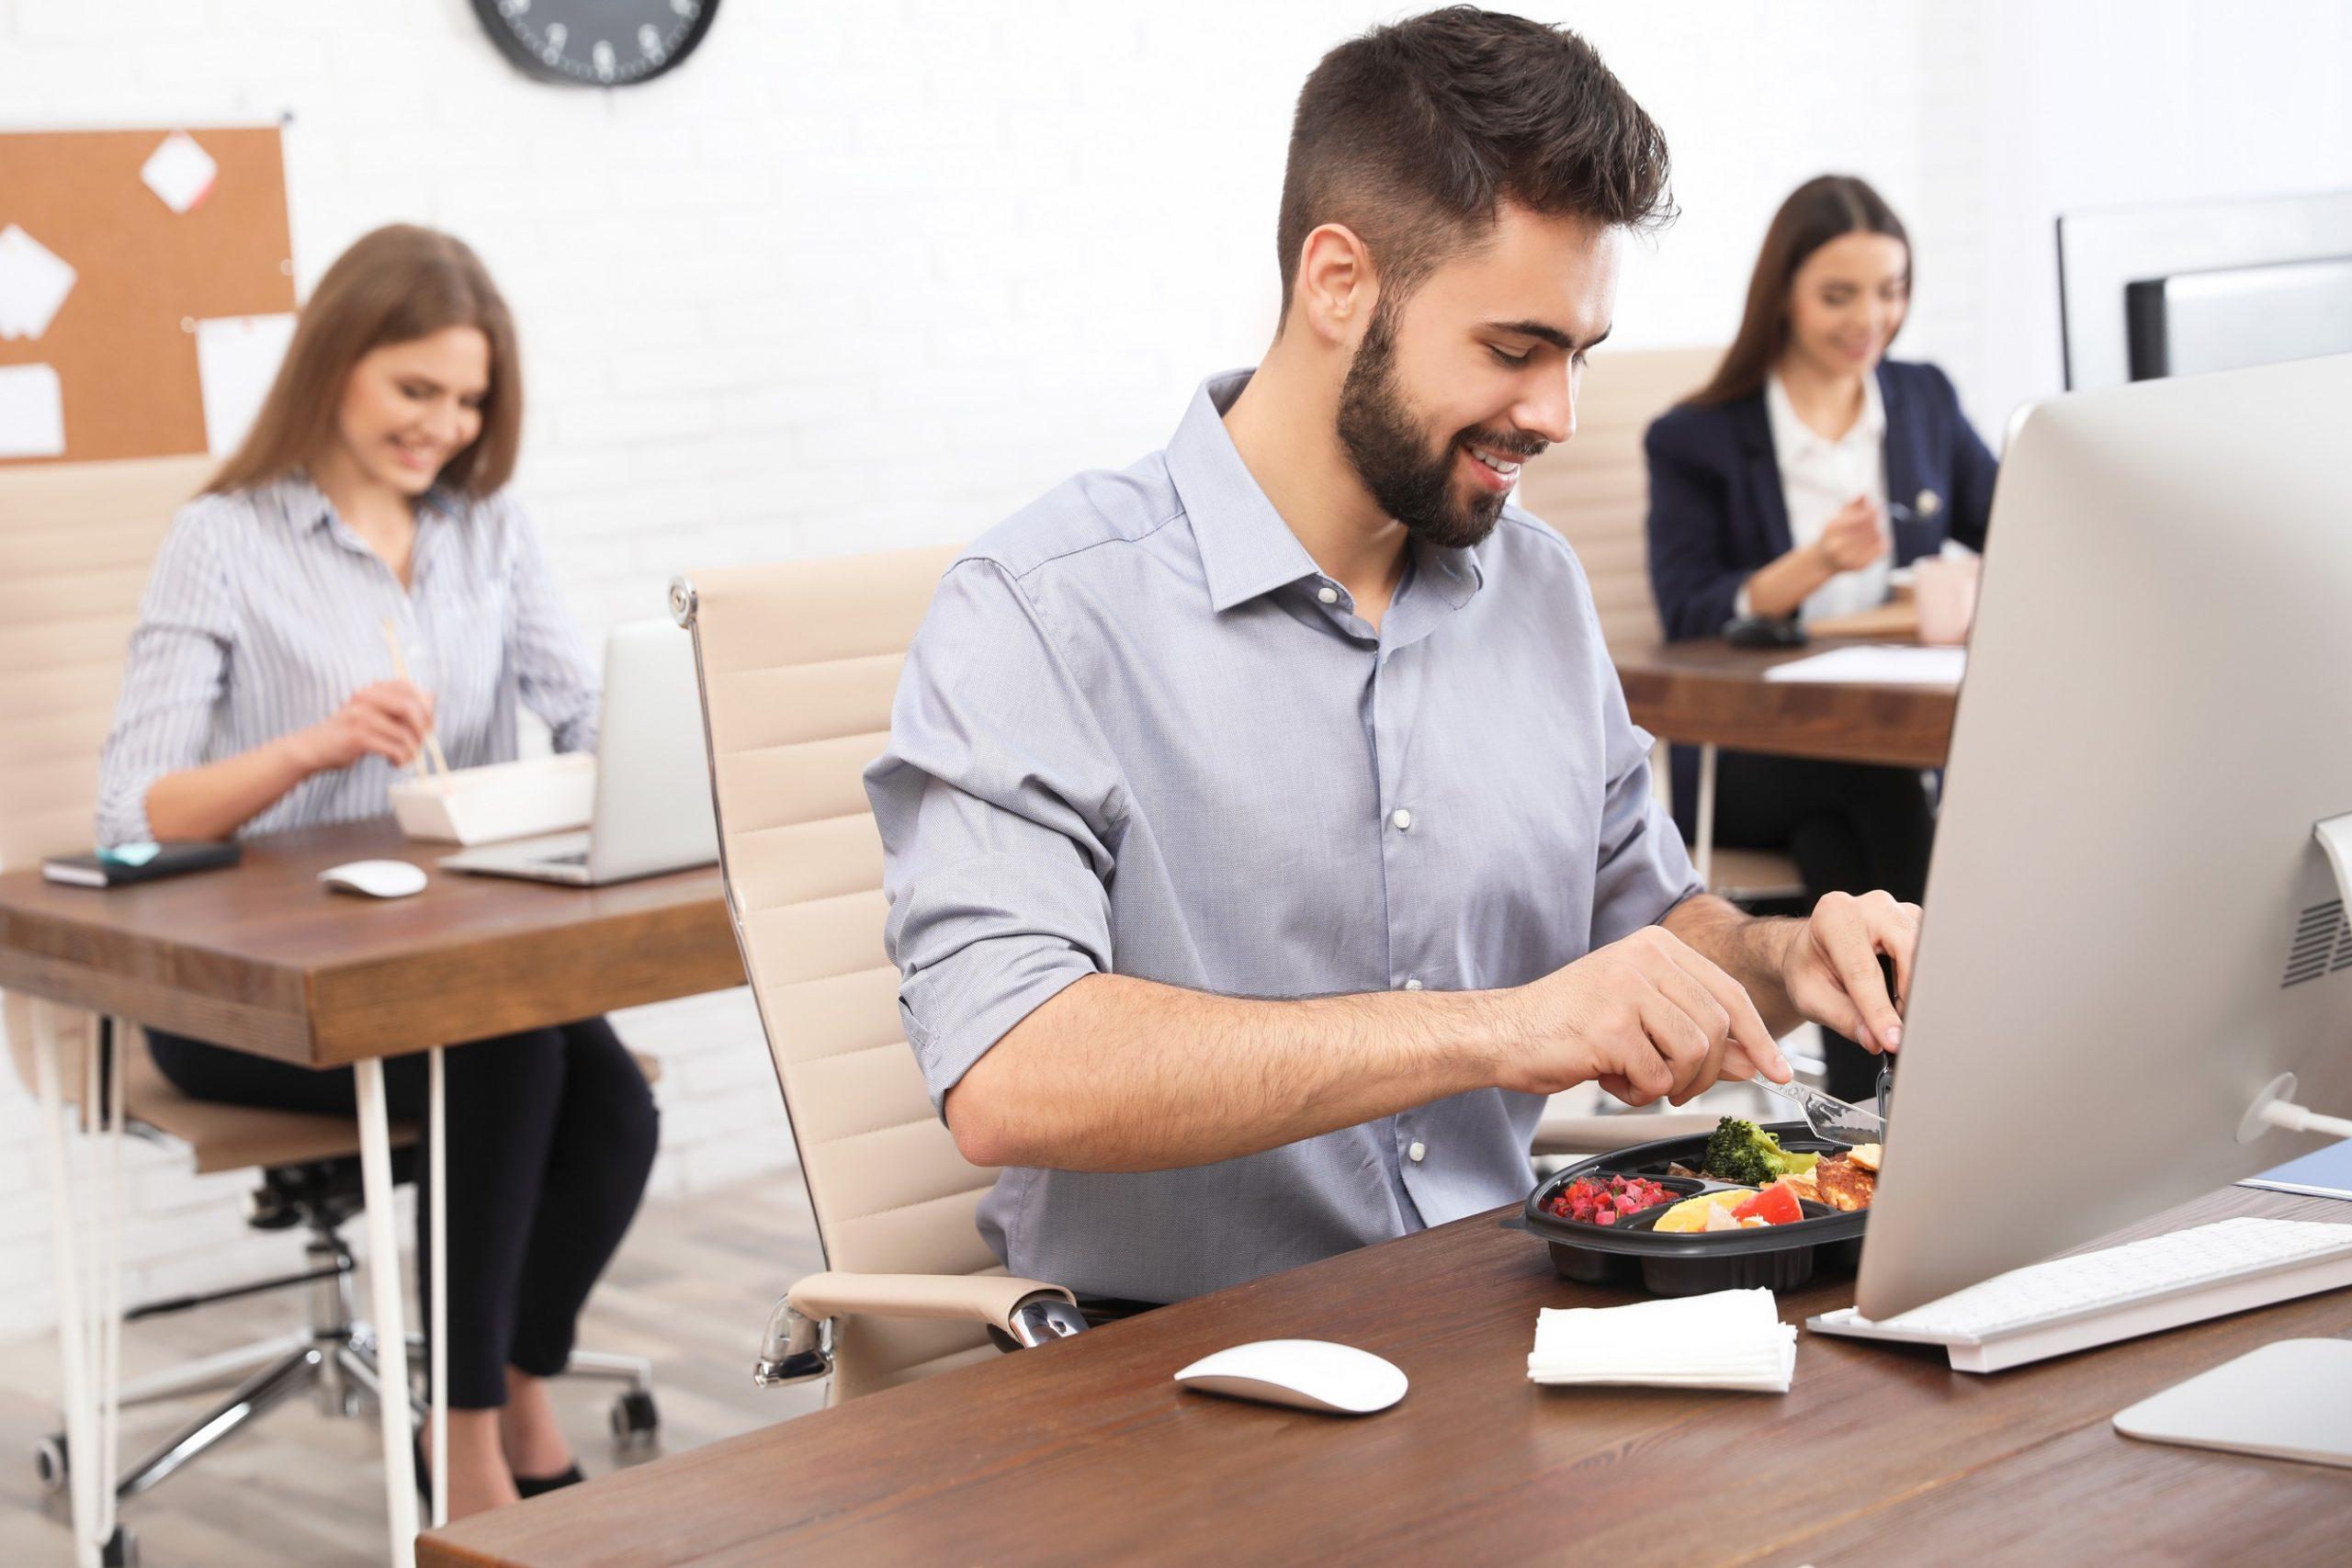 Scottsdale Vending | Break Room Solutions | Office Coffee Services